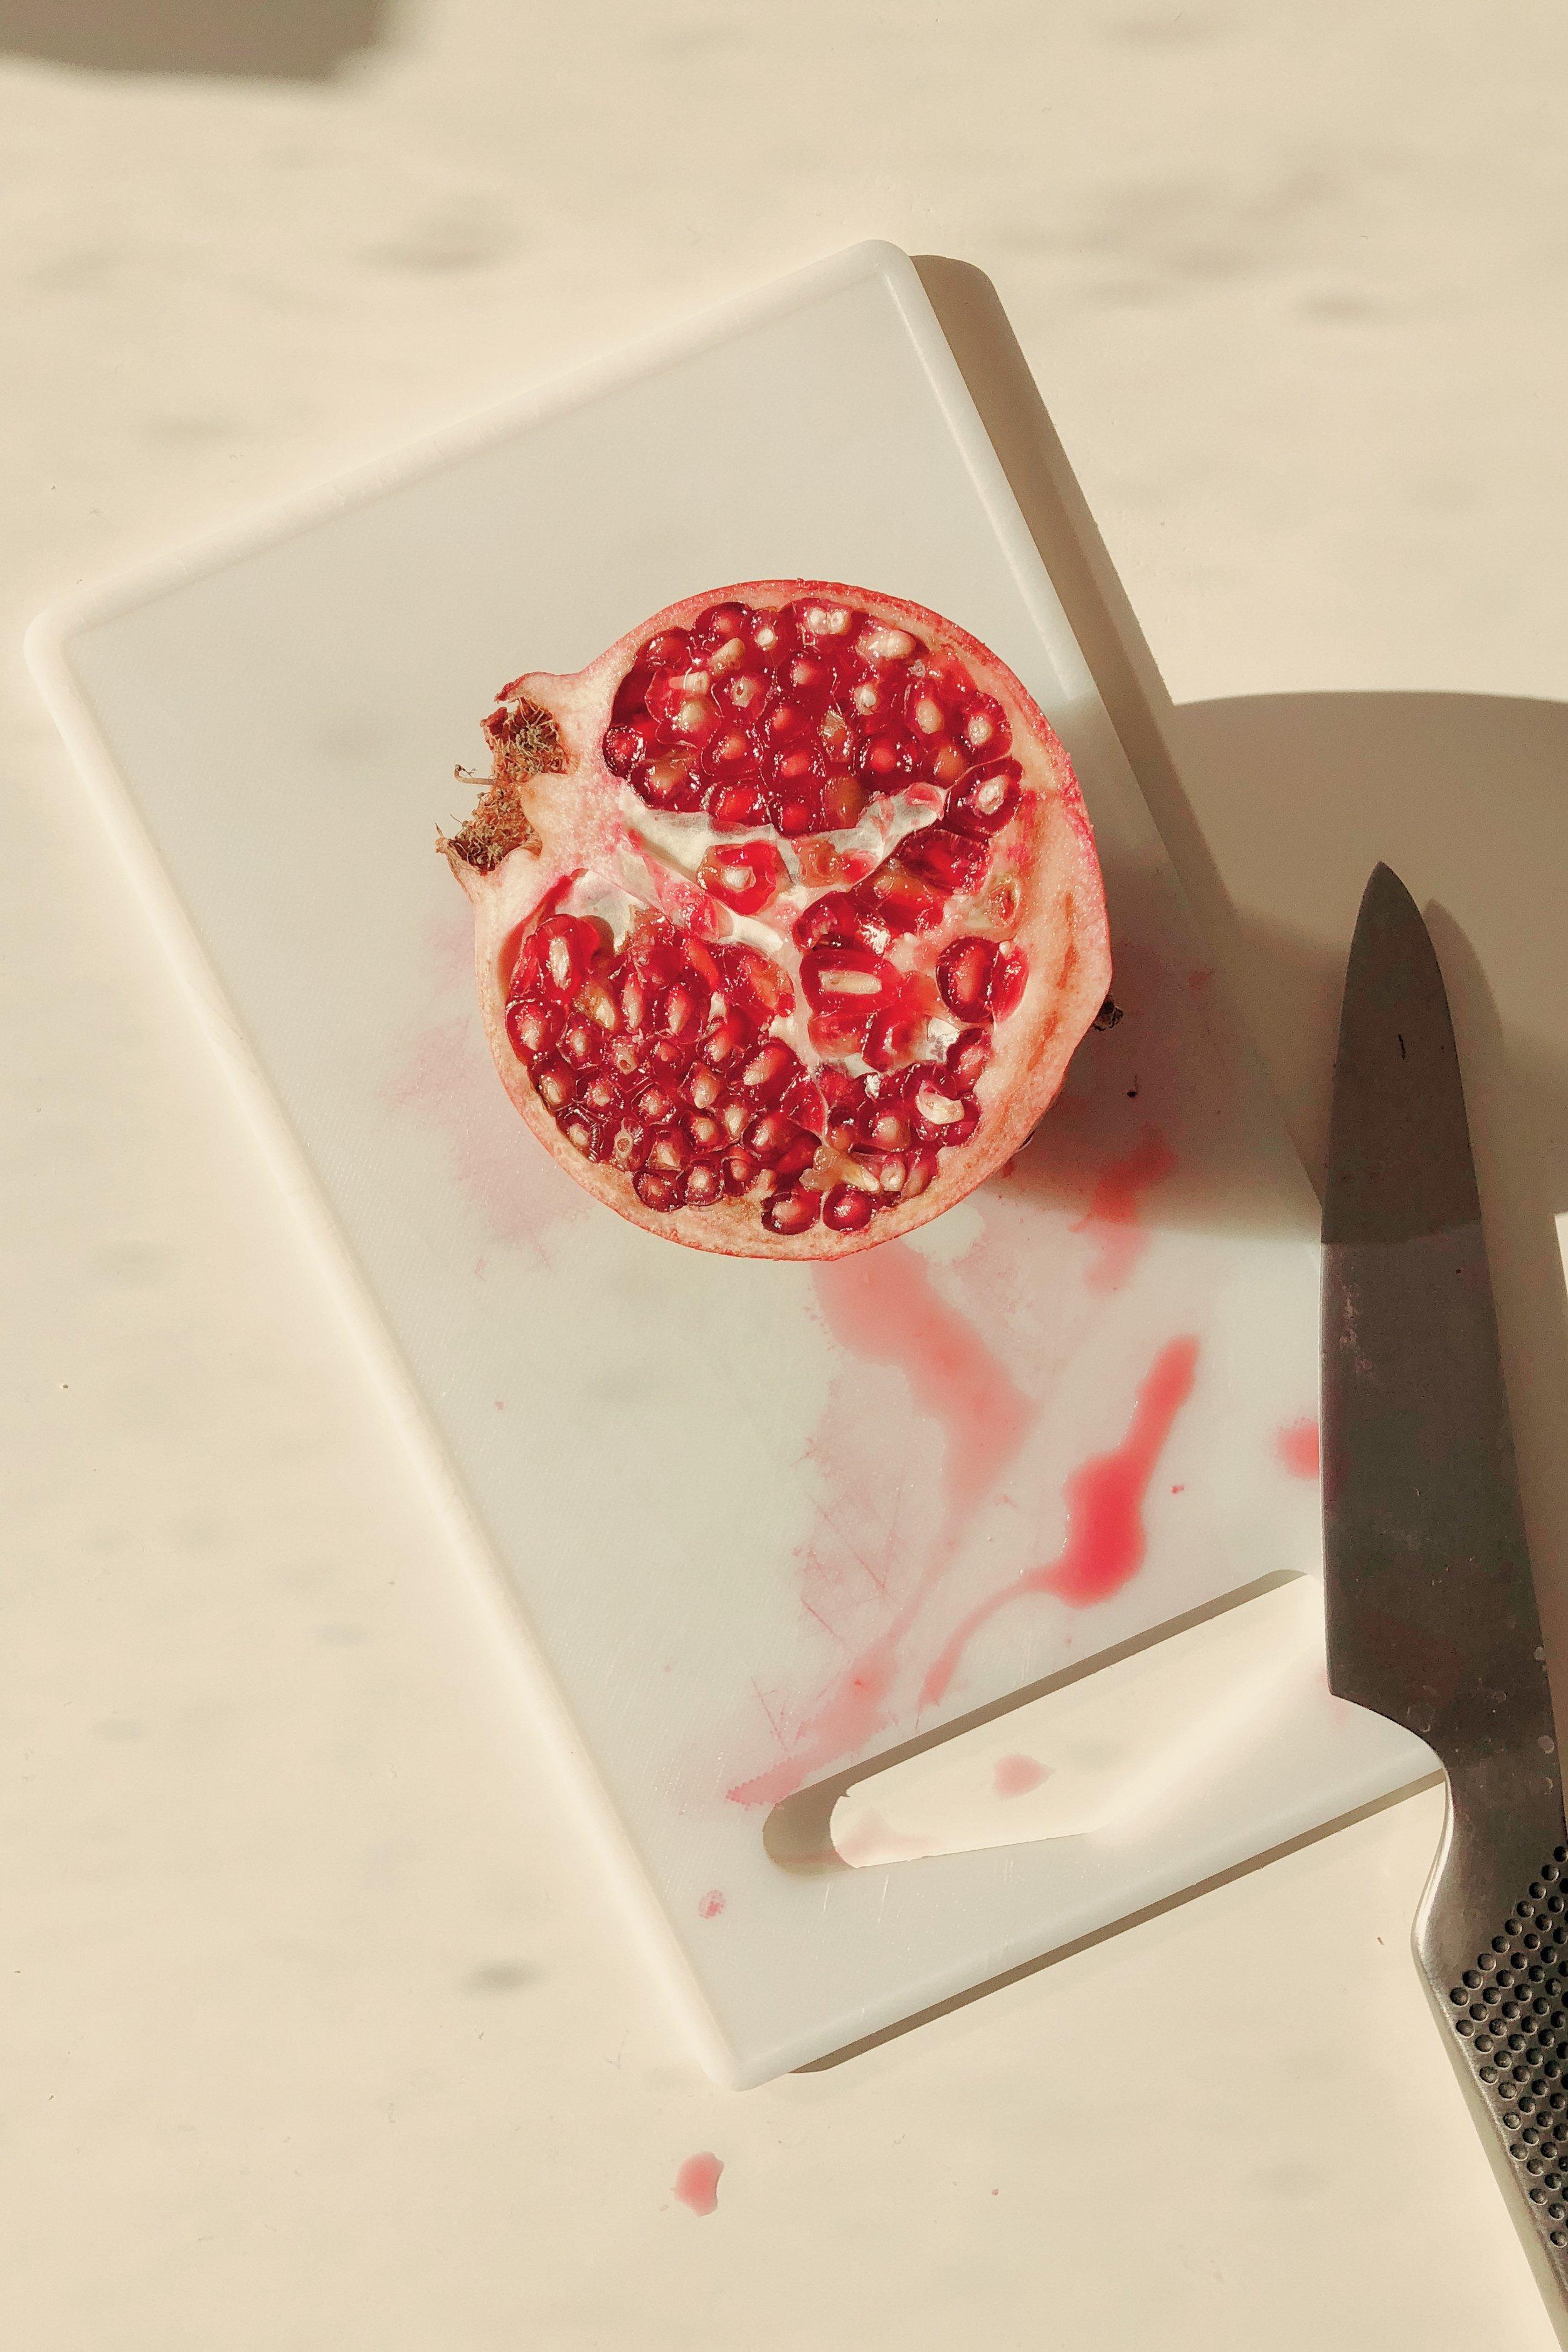 Superordinarylifepomegranate3.JPG